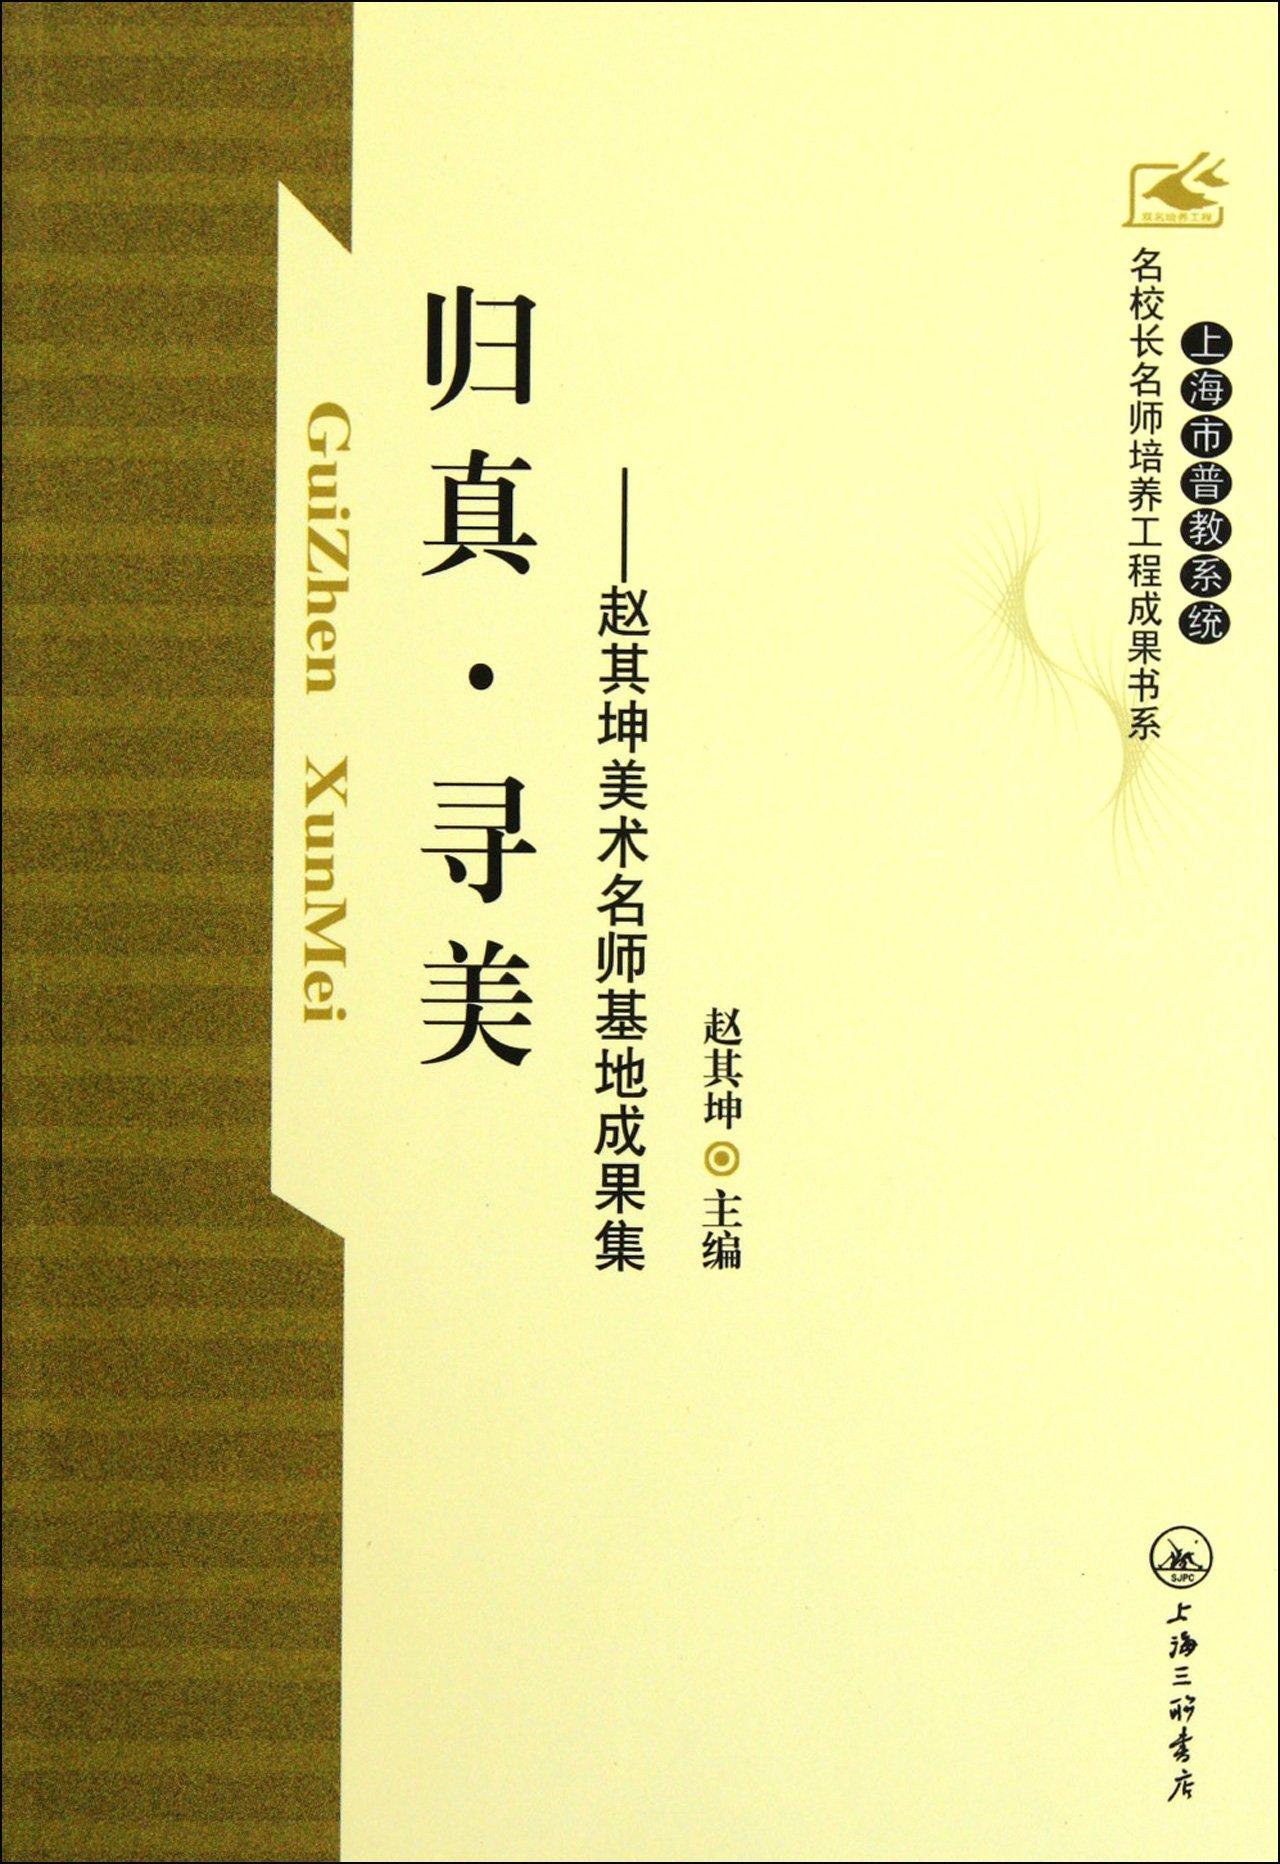 Maut · Seeking Beauty-- The Works of Zhao Qikun Artistic Teacher Base (Chinese Edition) pdf